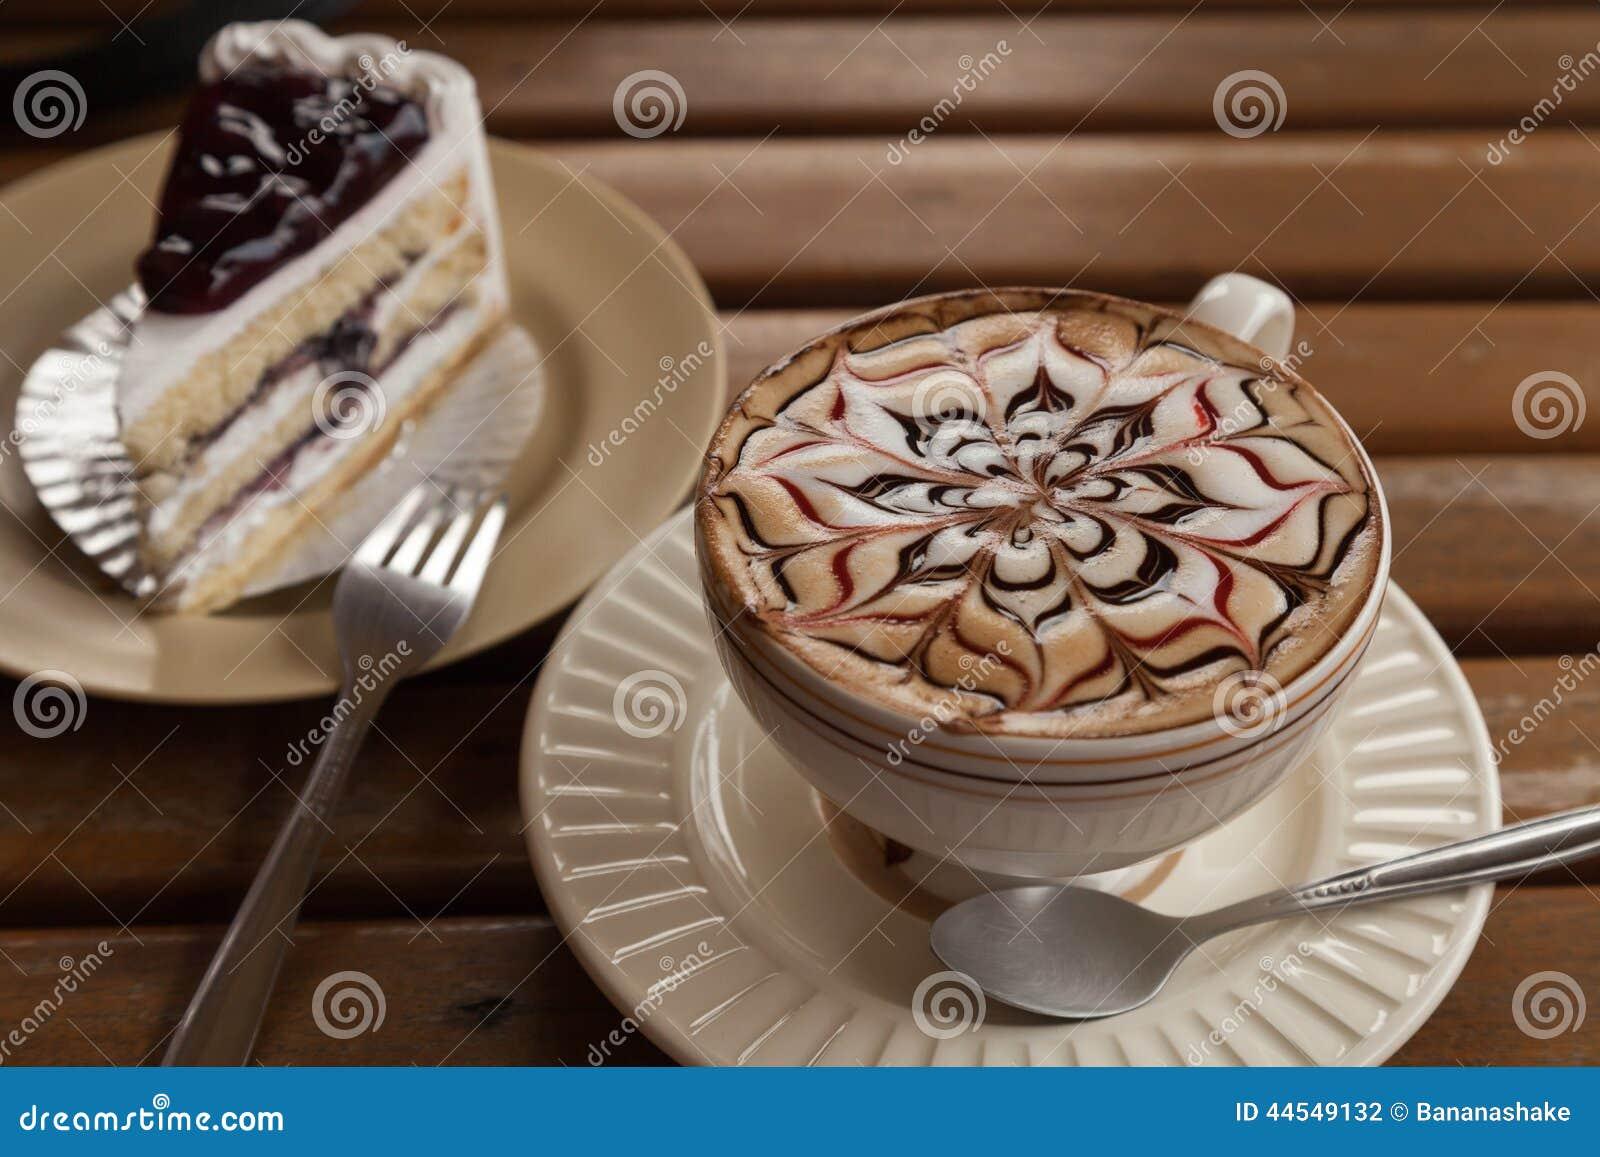 Decorate Cup Cake